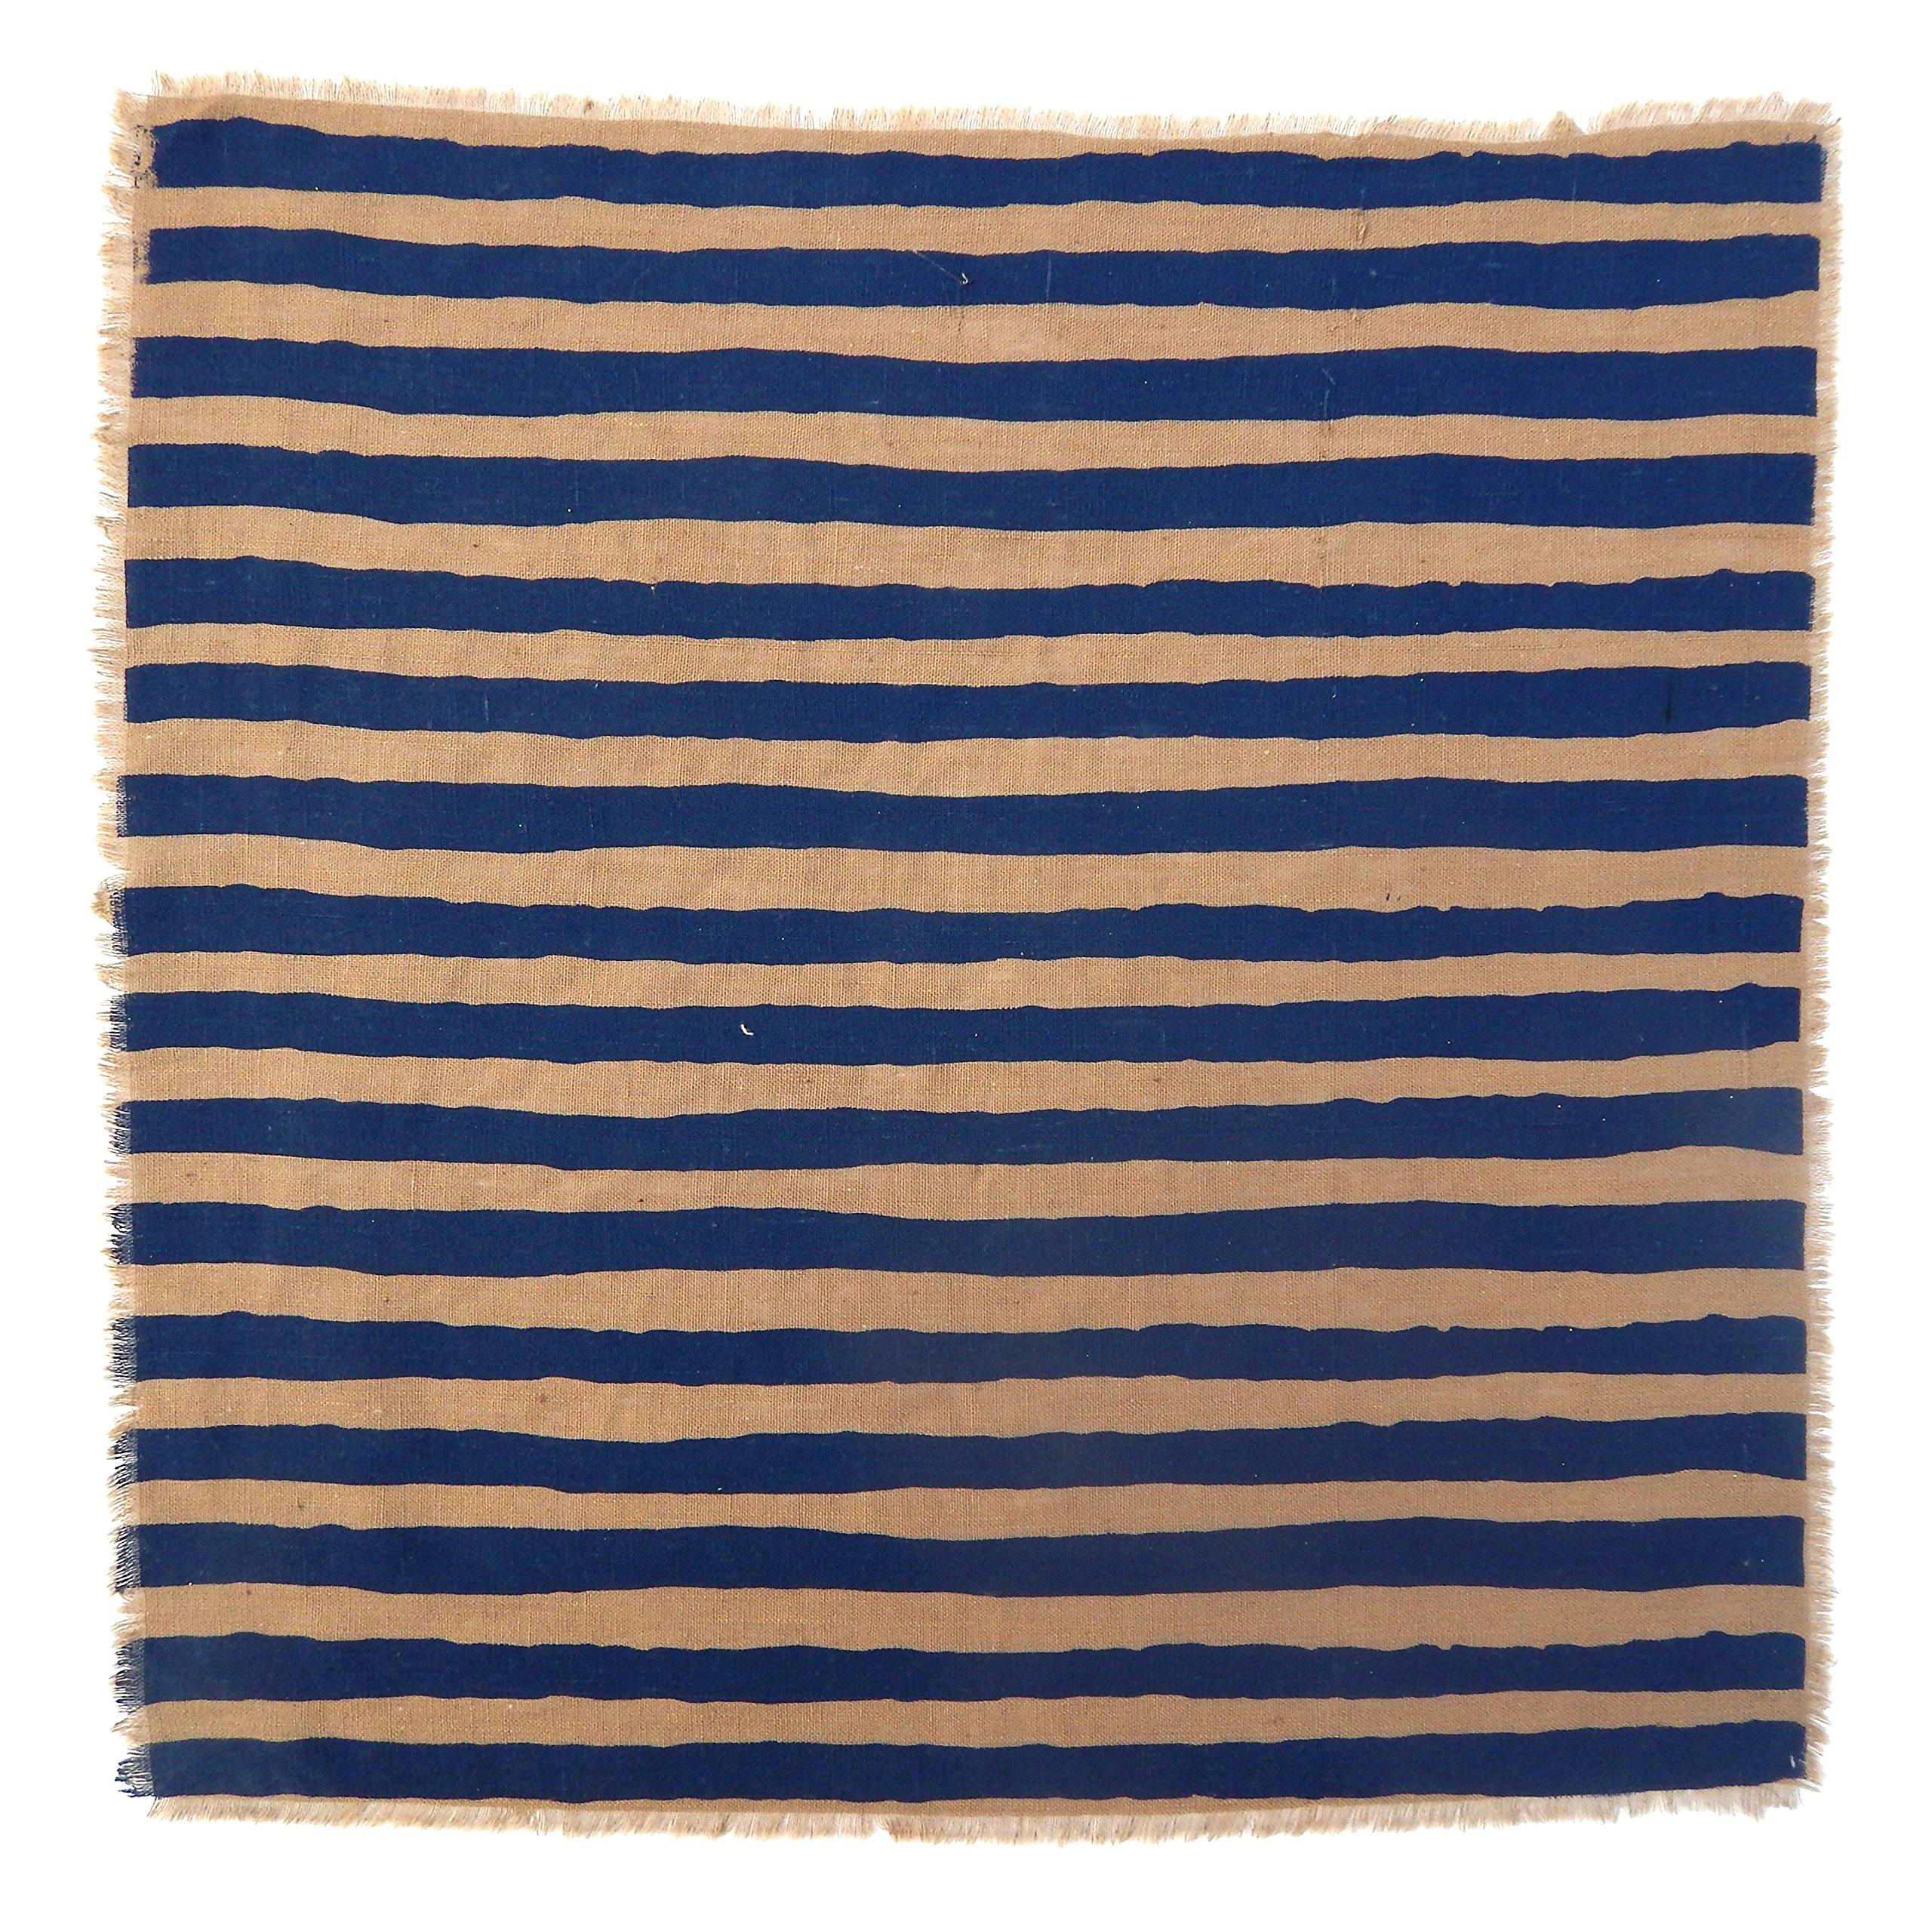 Gitika Goyal Home Windows Collection Cotton Khadi  Khaki Napkin 17x17 Stripe Design, Blue Hand Screen Print